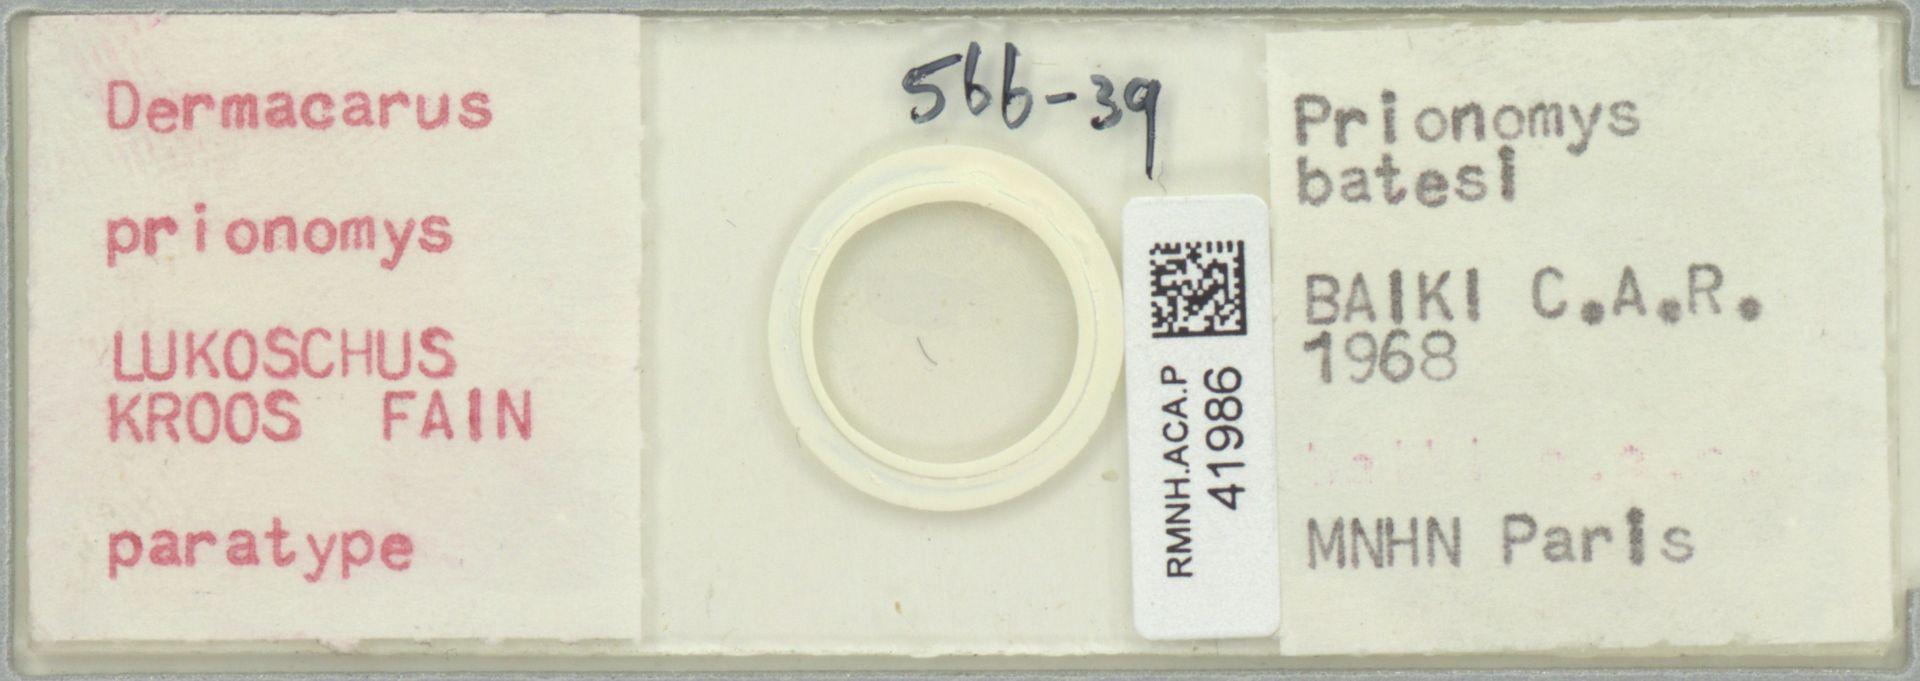 RMNH.ACA.P.41986 | Dermacarus prionomys Lukoschus, Kroos, Fain